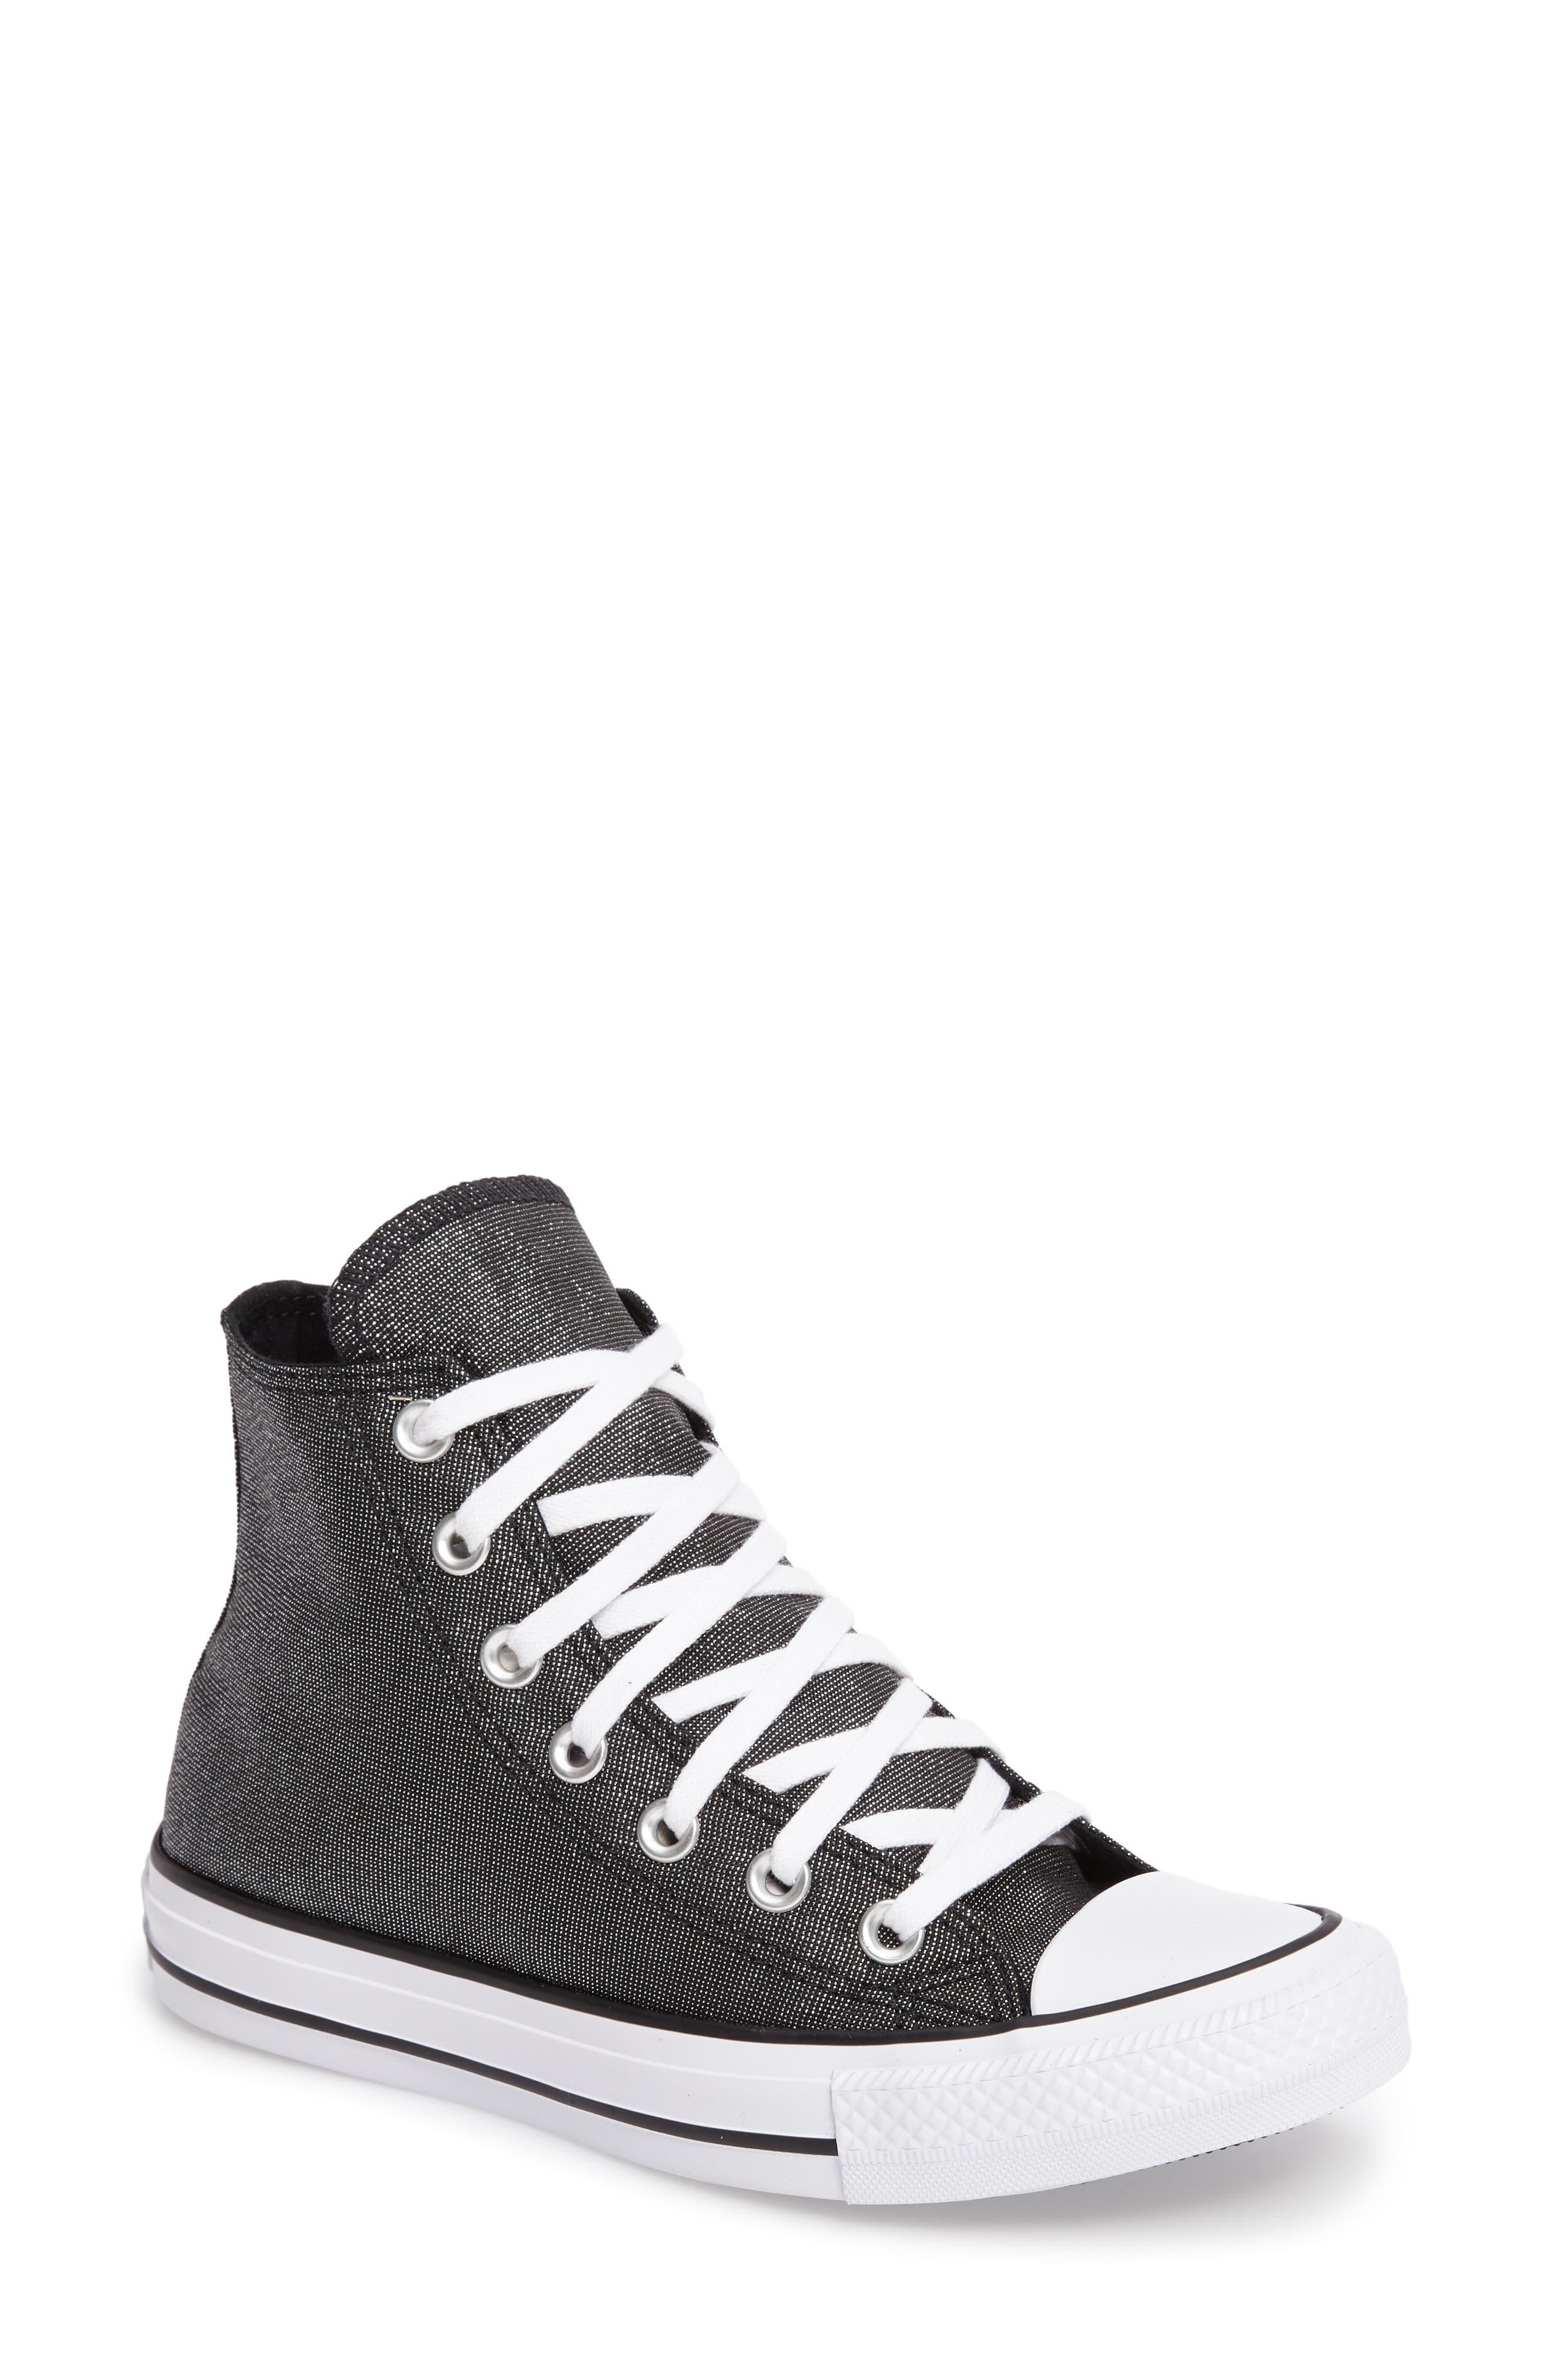 CONVERSE Chuck Taylor® All Star® Glam Hi Sneaker